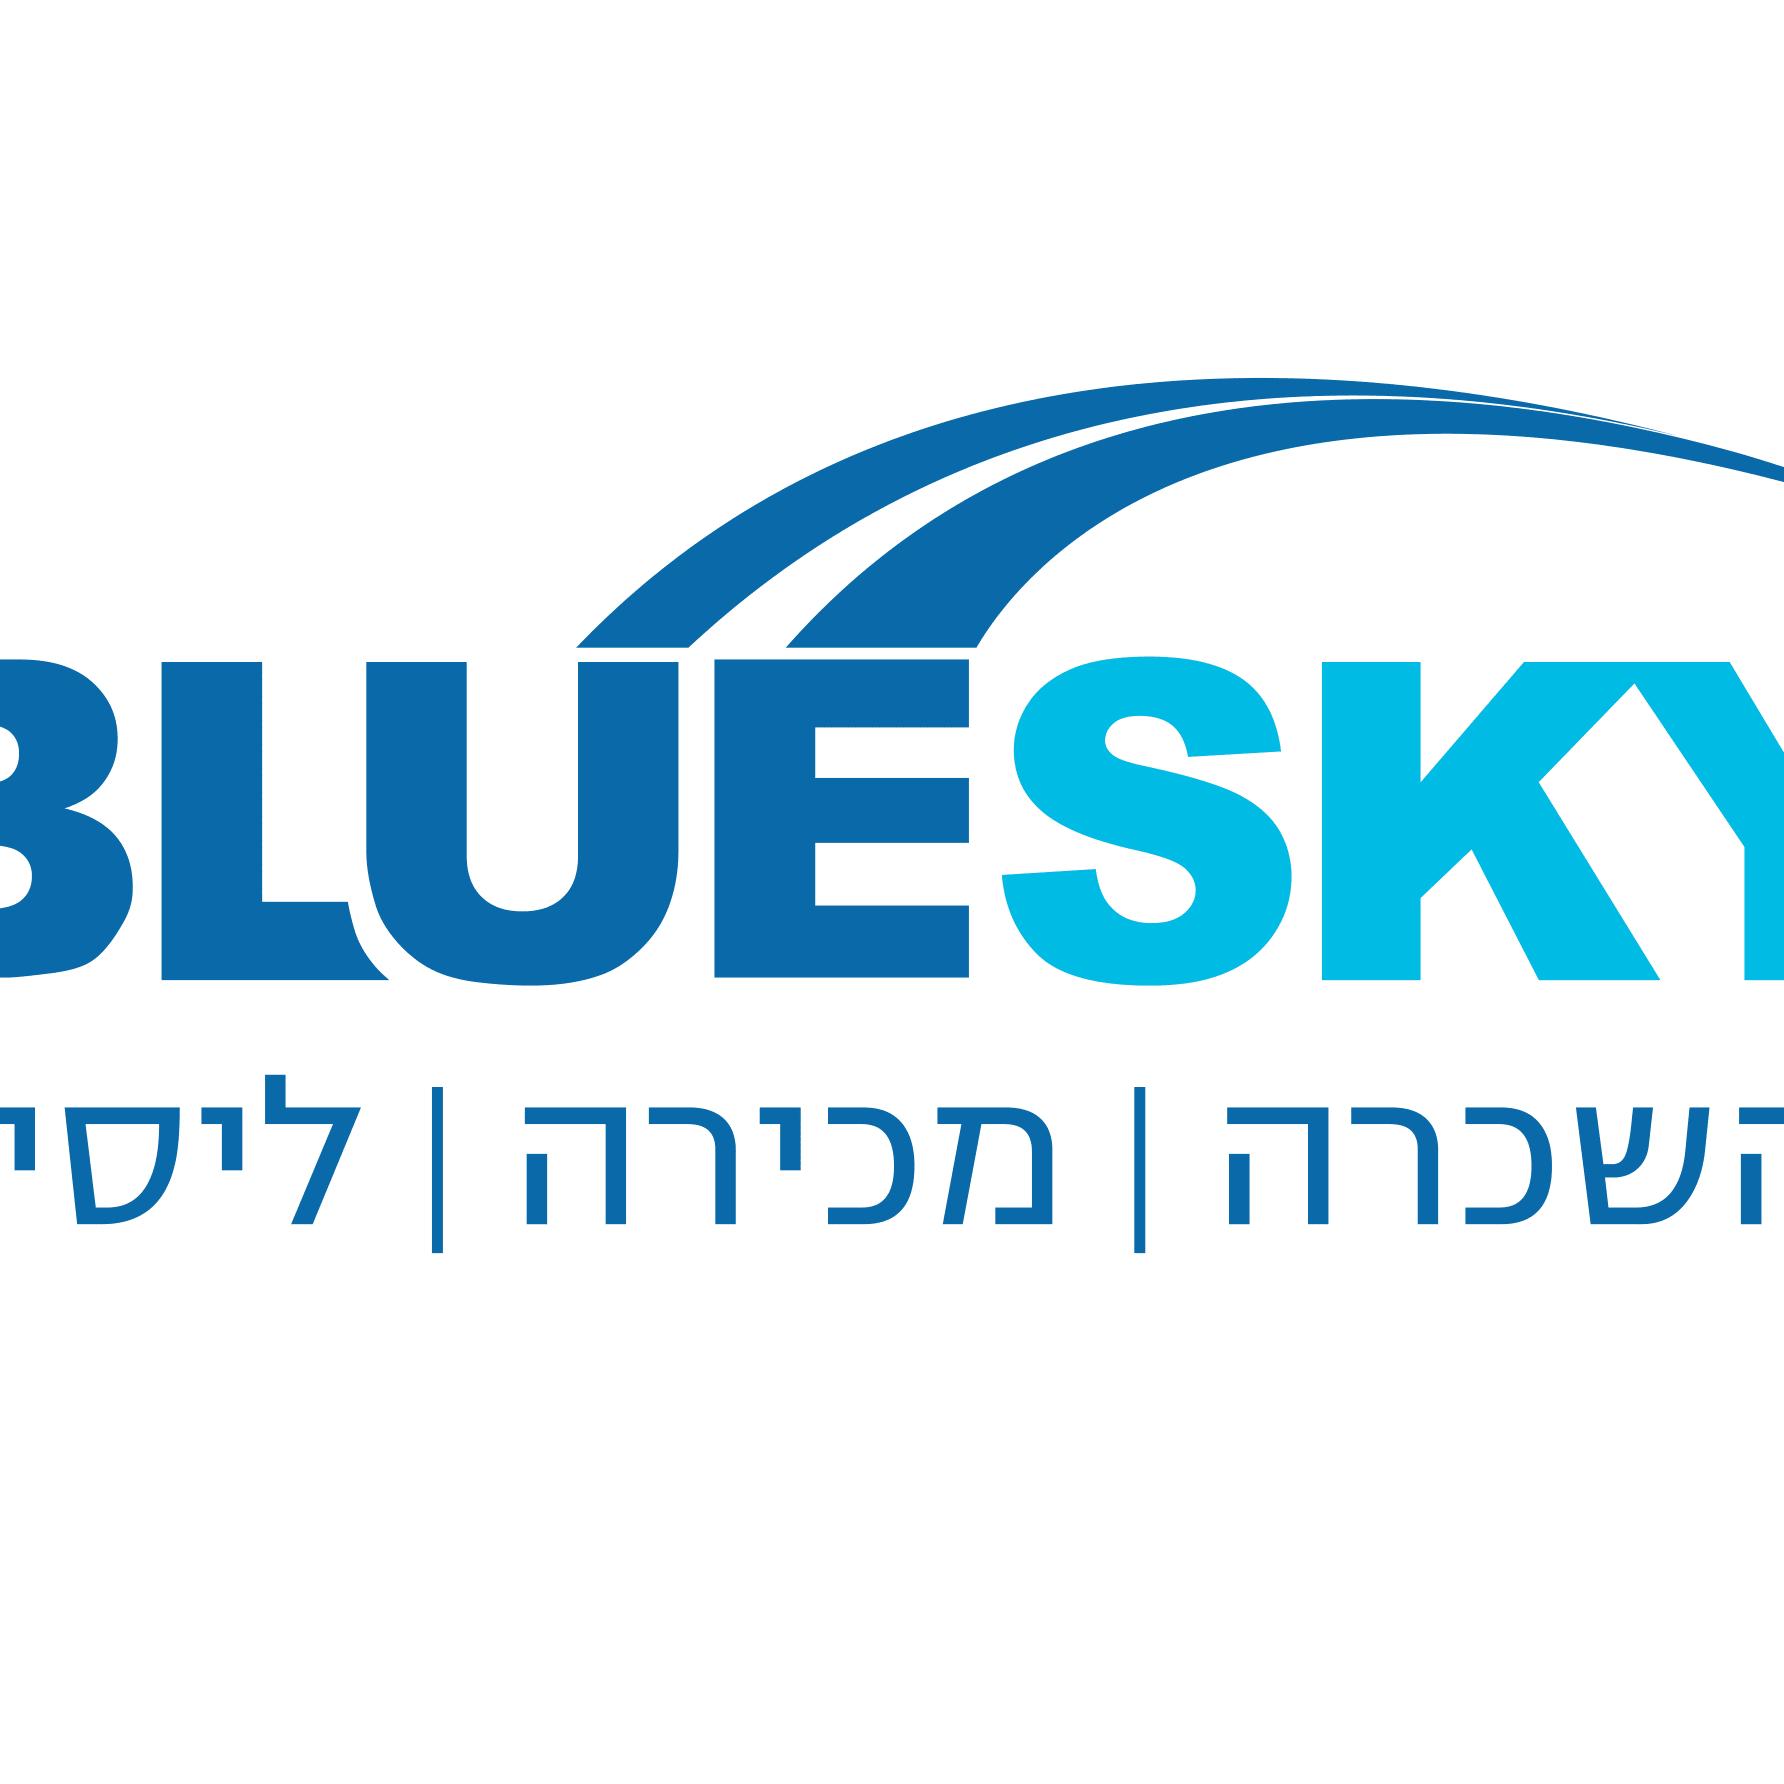 BLUE SKY  - השכרה, מכירה וליסינג logo